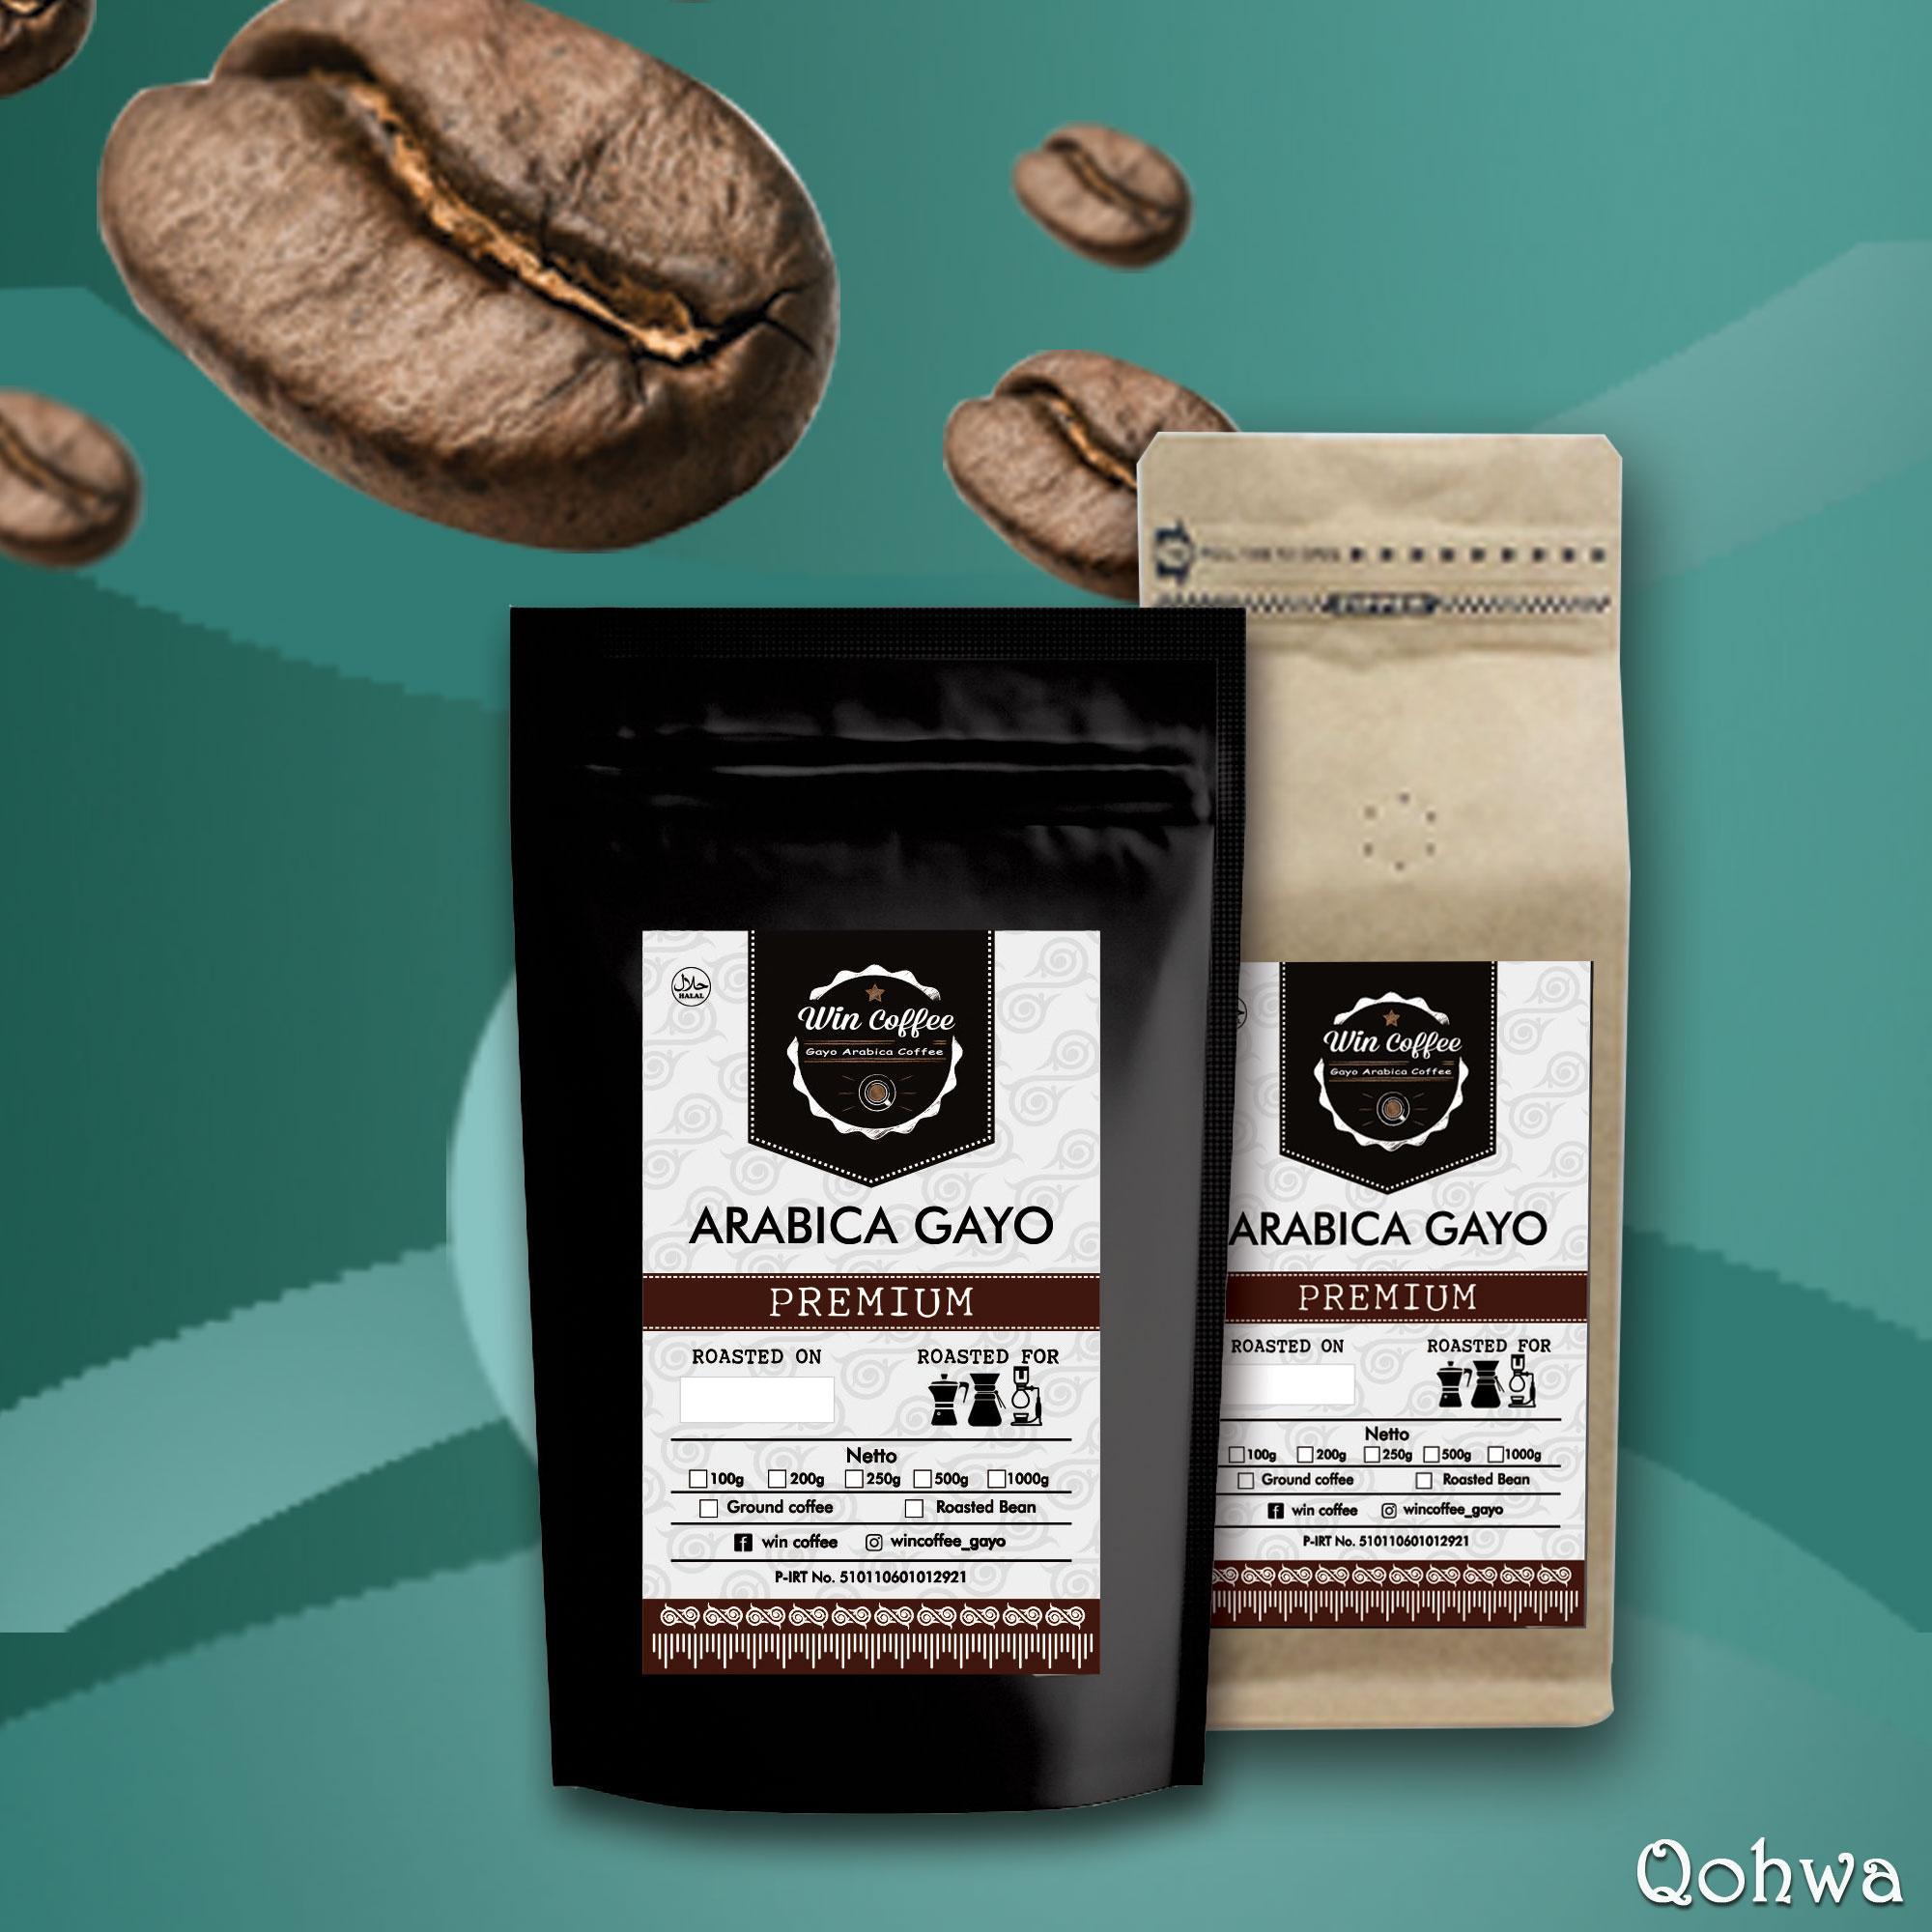 Erzcoffeehouse Coffee Blend Erz House Arabika Robusta Kopi Biji Bubuk Rajabica Koffie Warung Tinggi Premium 100 Gram Source Qohwa